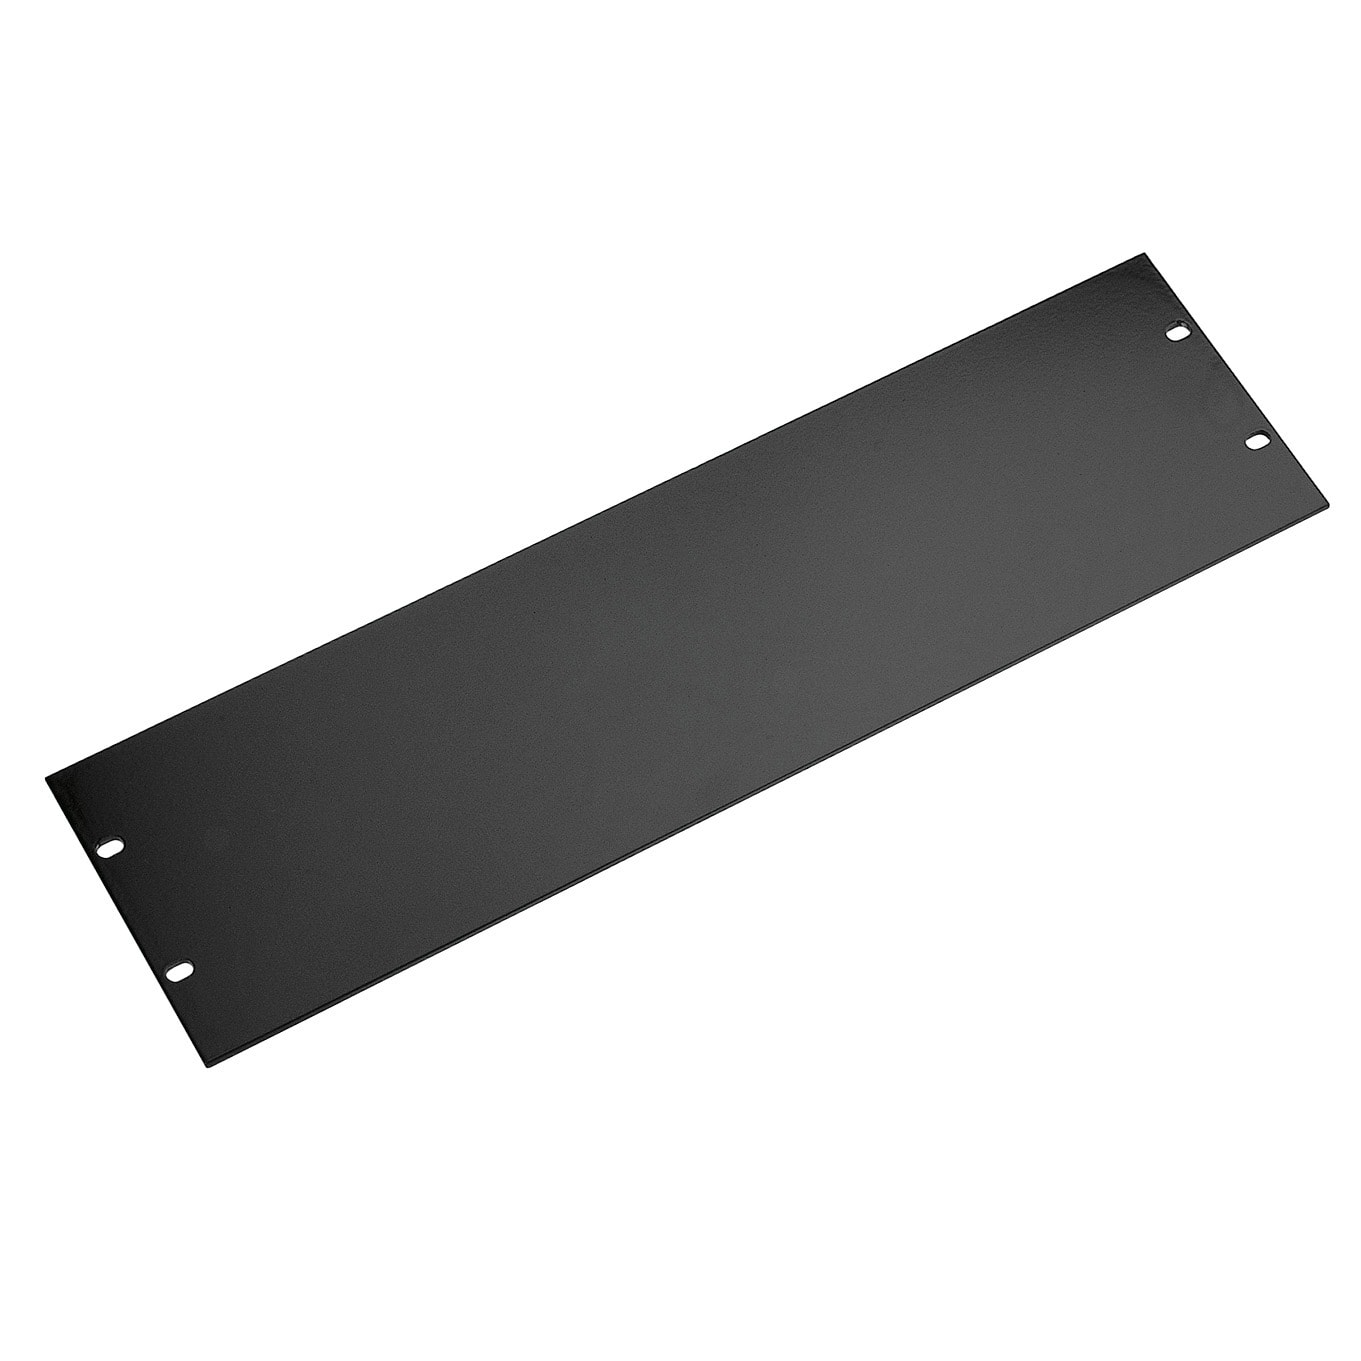 "KM282 - 19"" Flat aluminum blind panels"